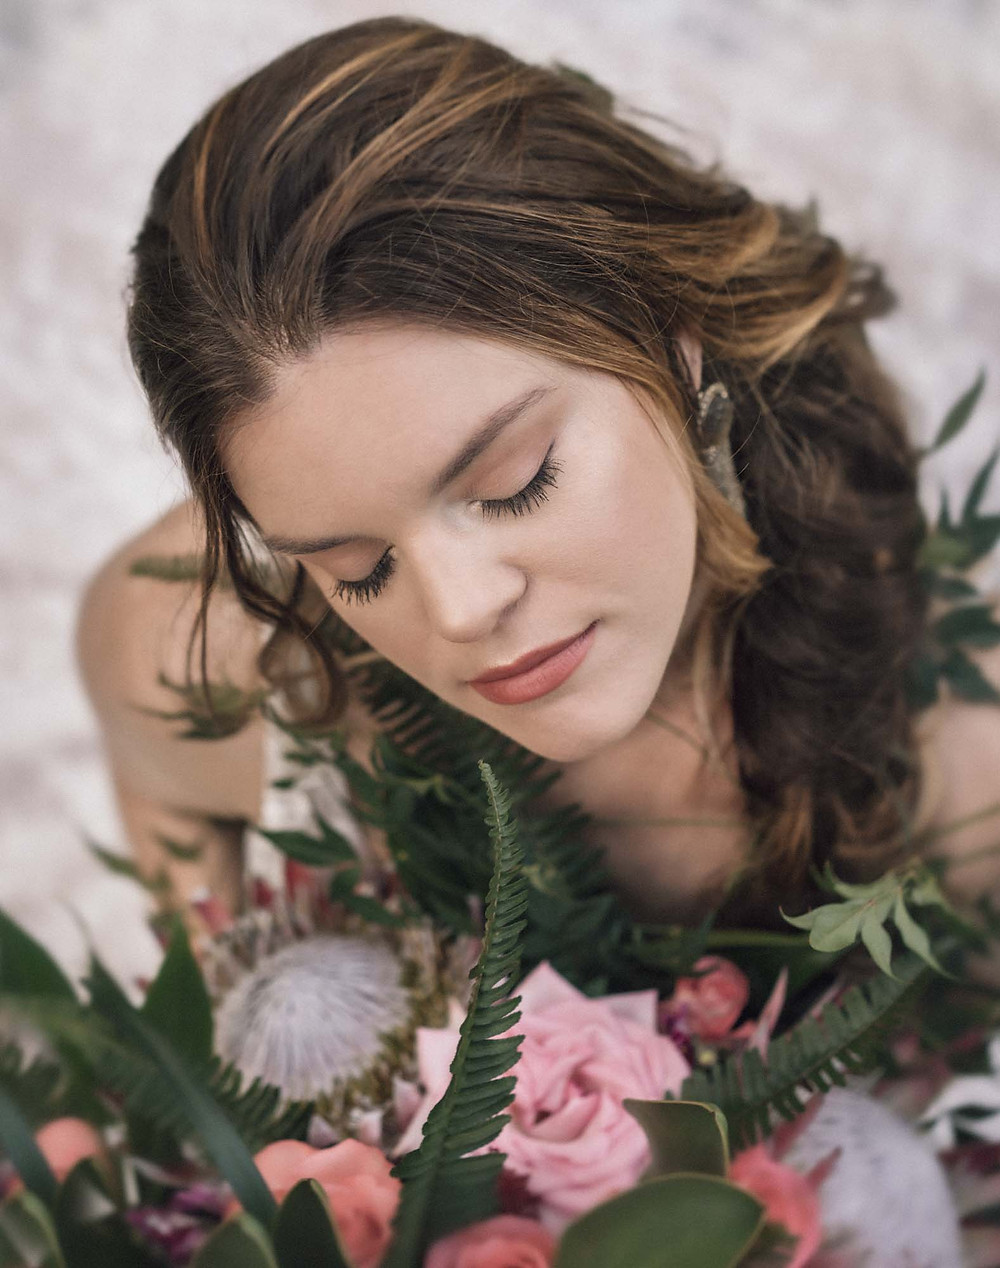 Maui Hair and Make-up for Weddings